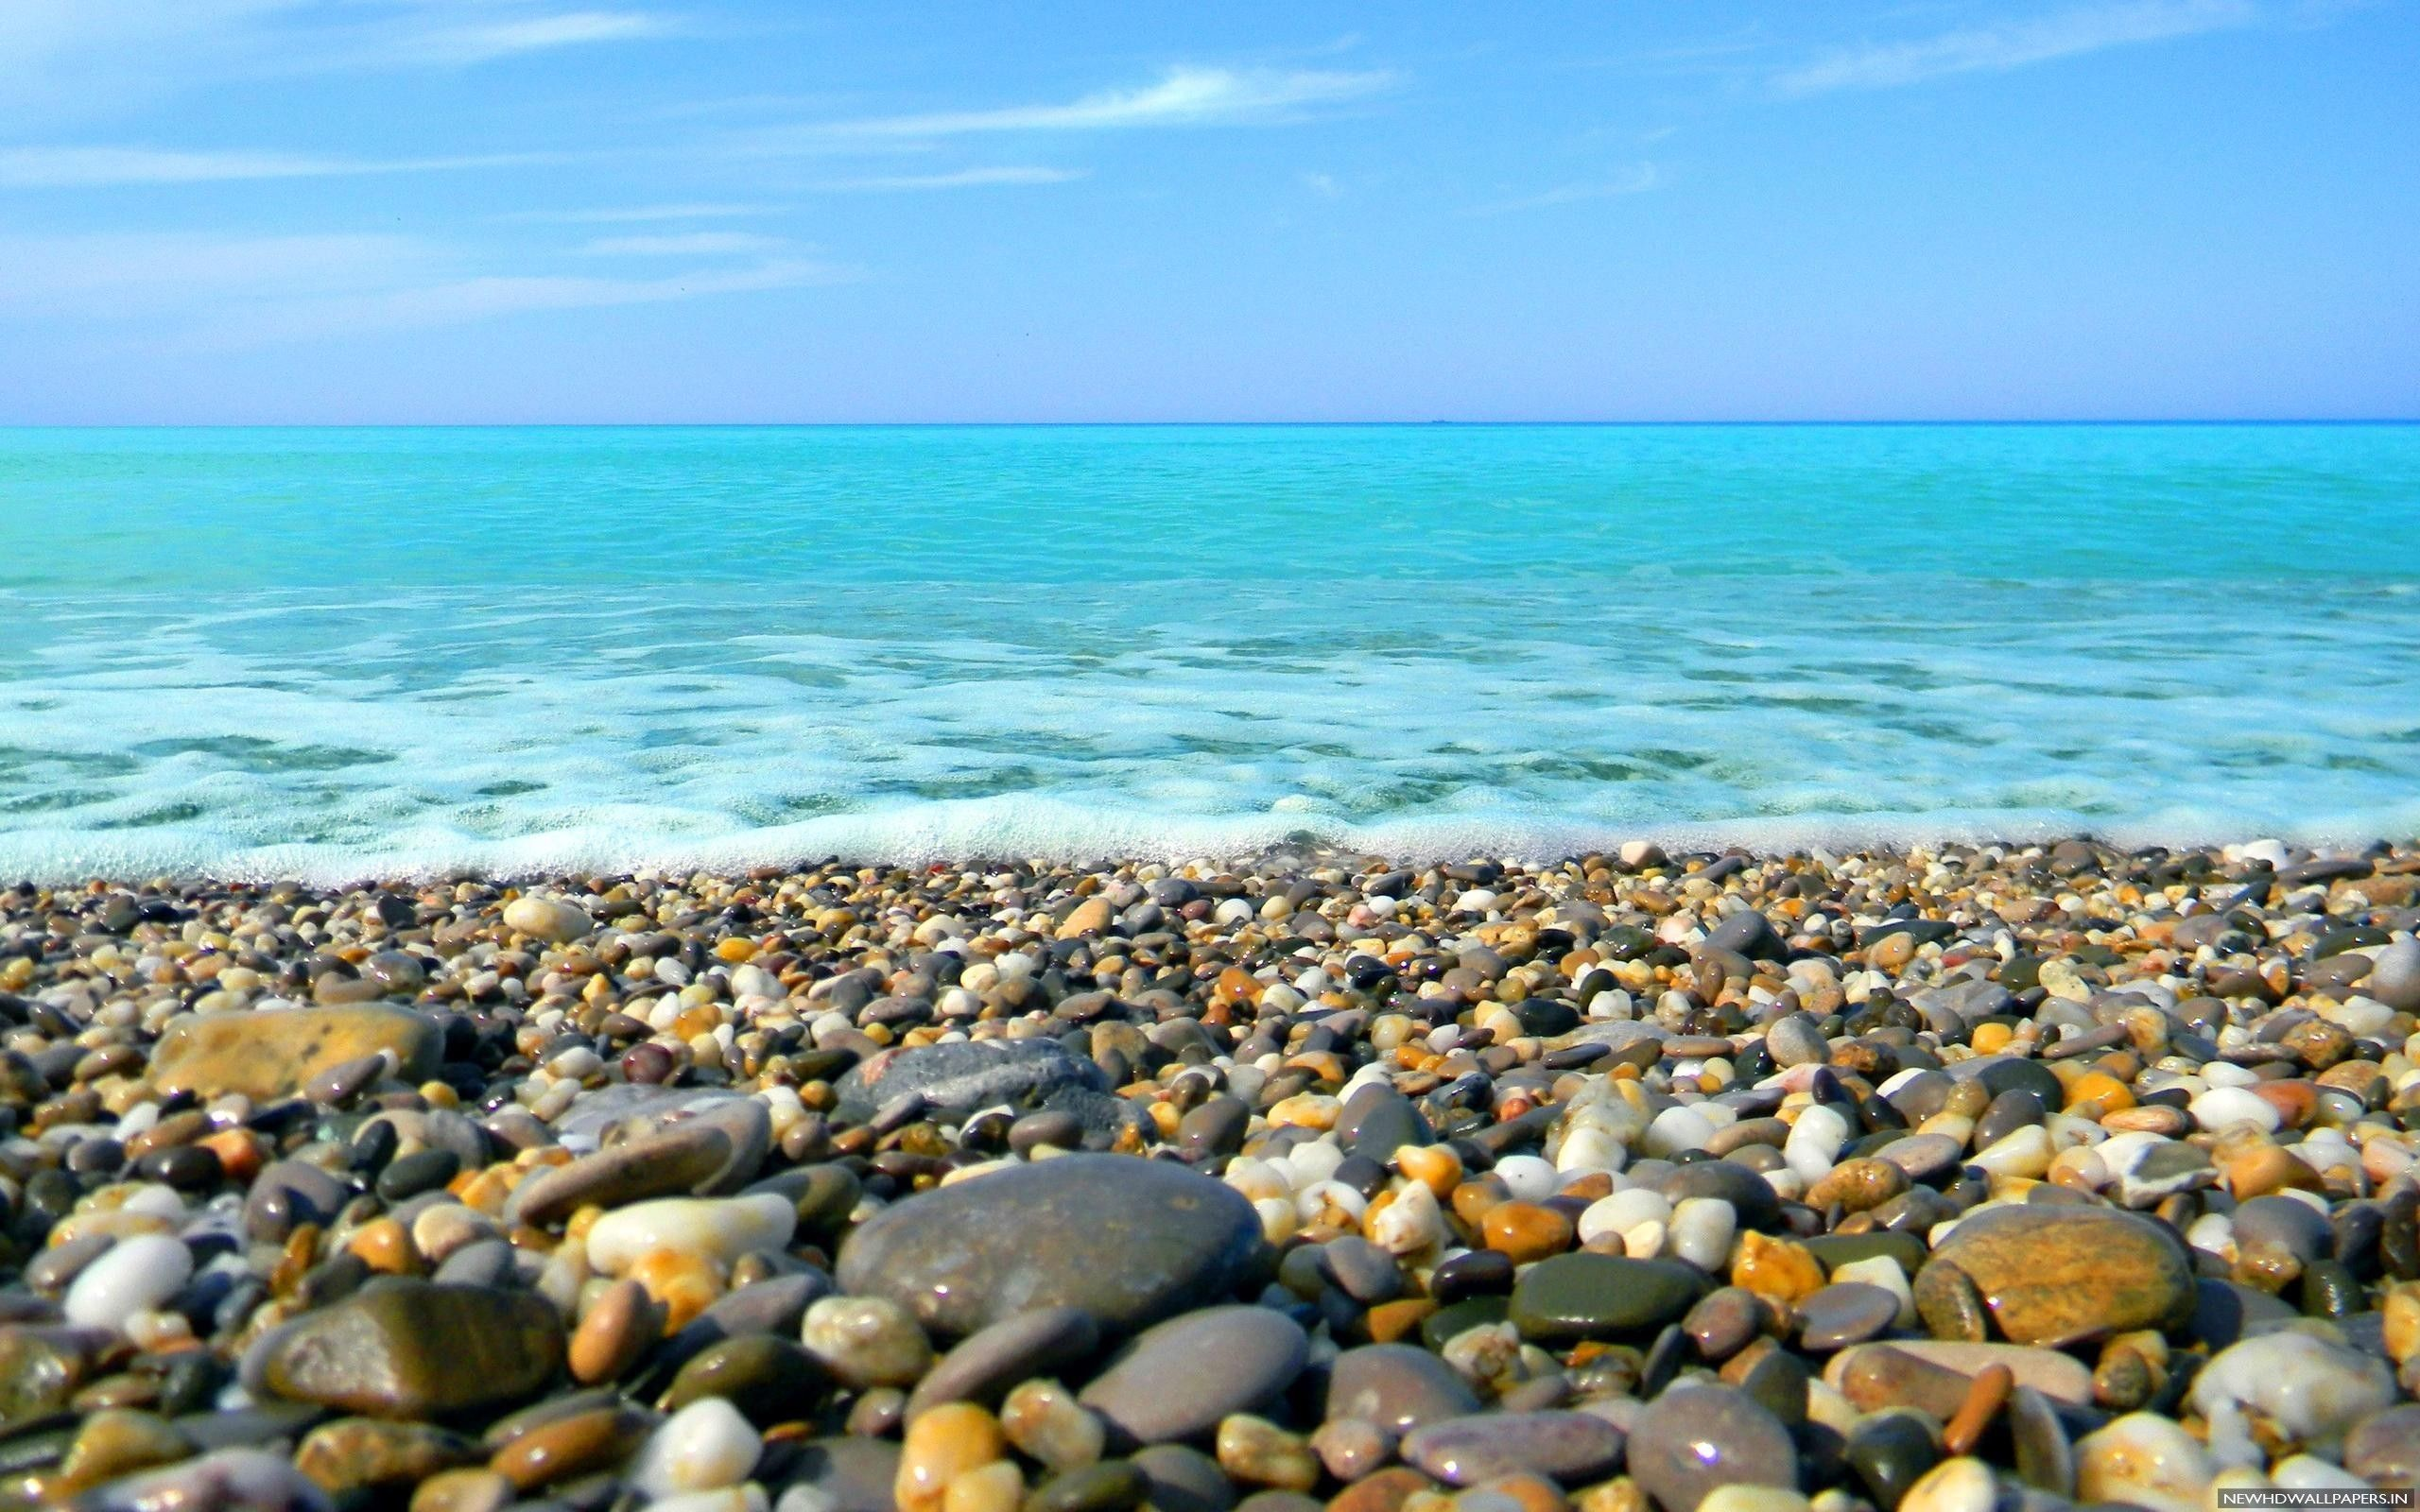 Res: 2560x1600, Beach Photos, Waves Wallpaper, Beach Wallpaper, Beach Background, Hd  Backgrounds, Tropical